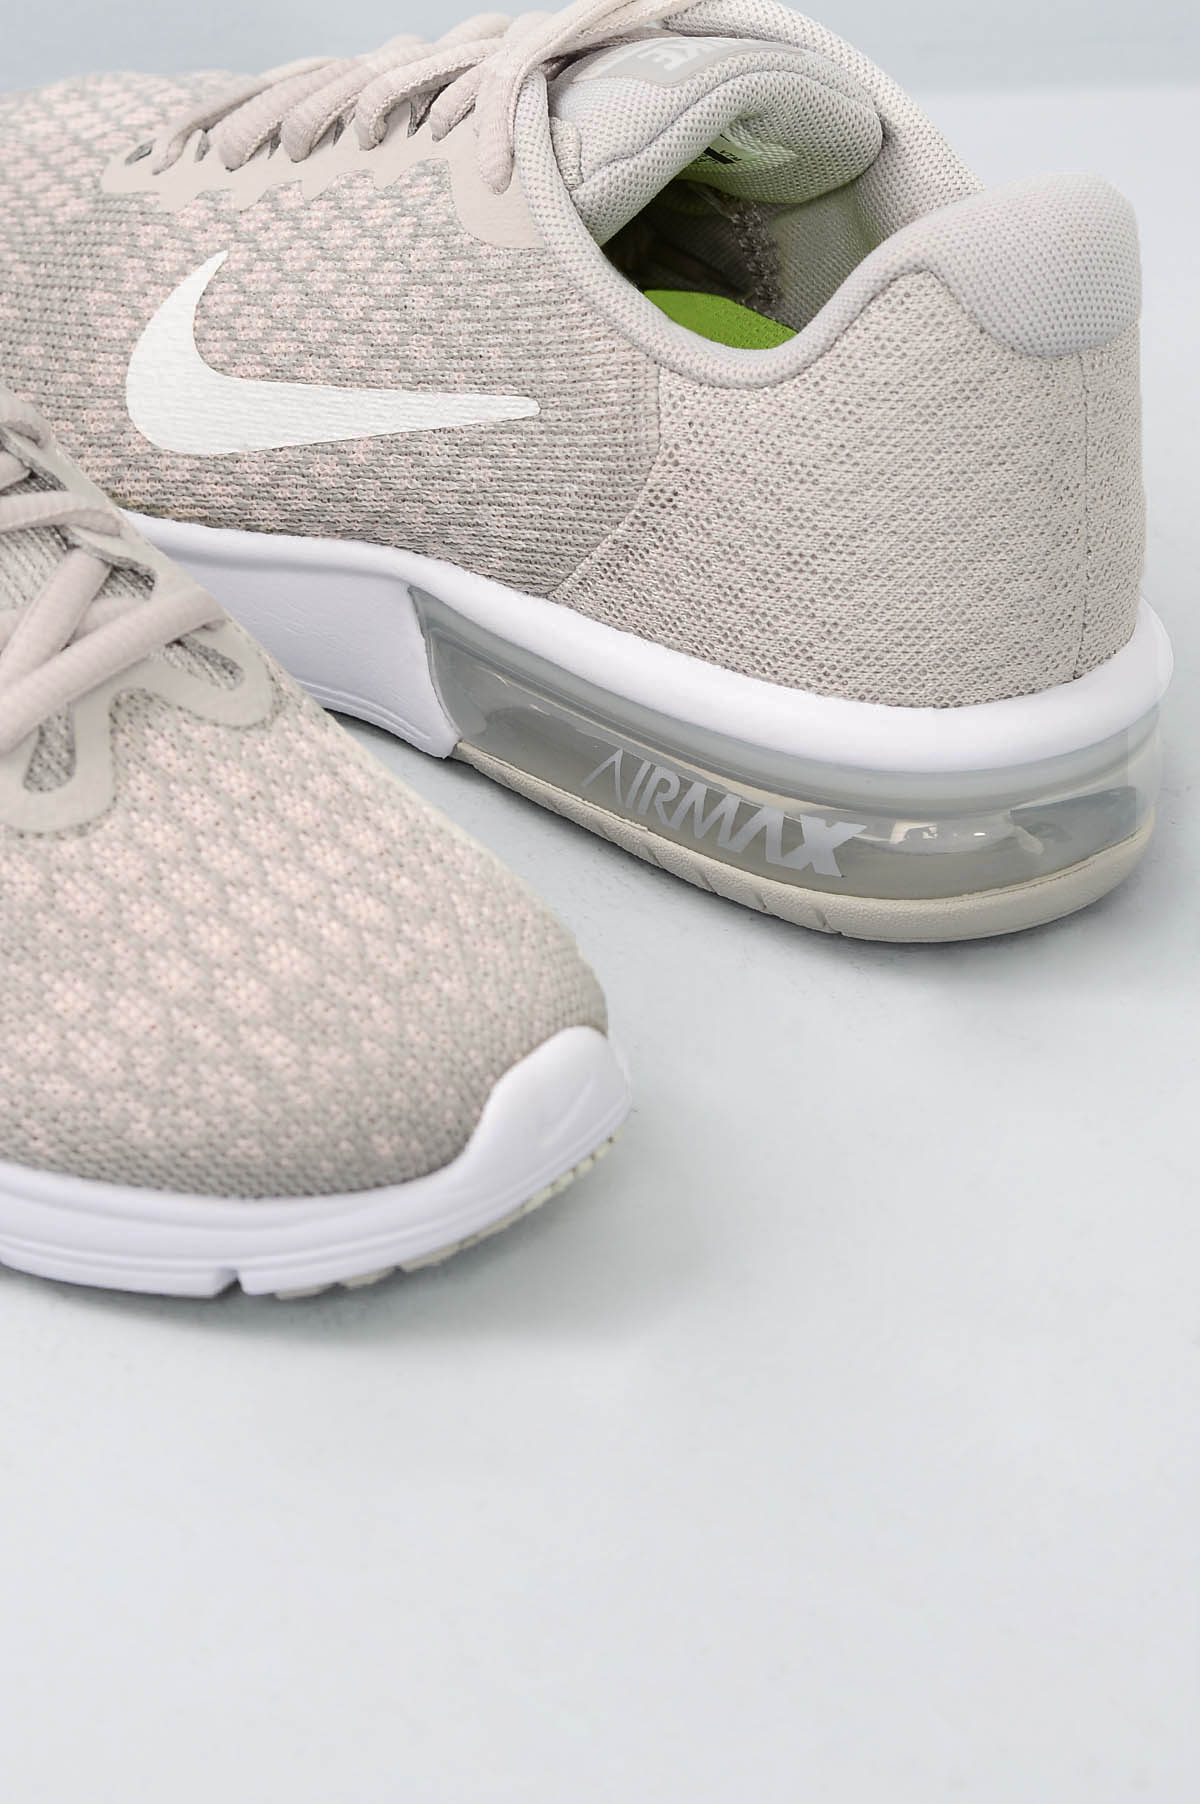 Tênis Feminino Nike Air Max Sequent 2 TEC - ROSA - Mundial Calçados 7a33a565f3ba6